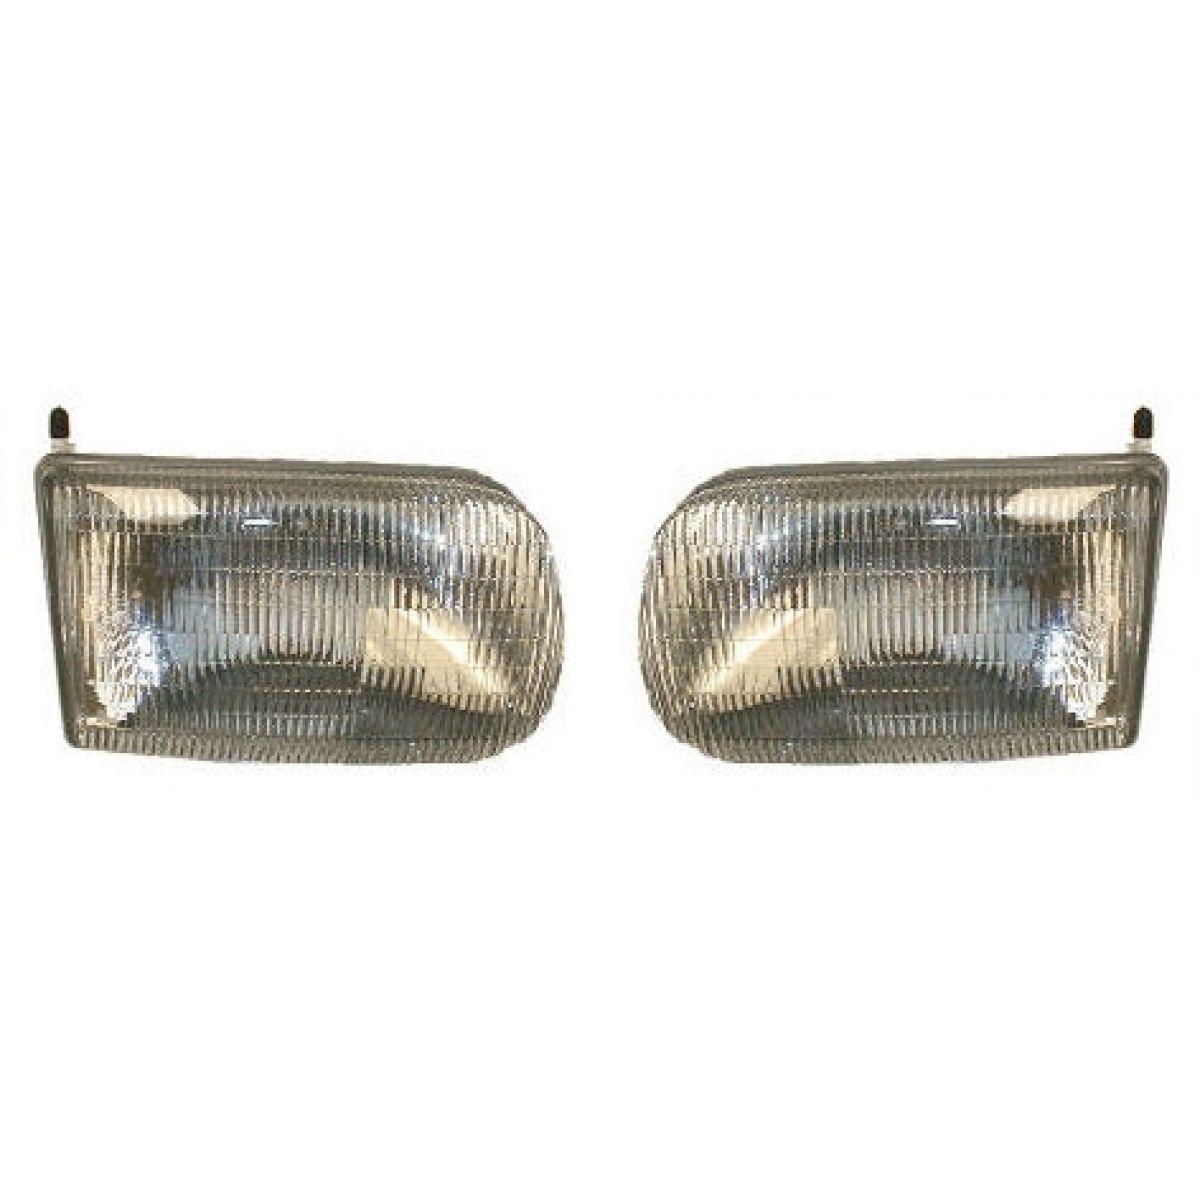 headlight headl pair set for 94 97 mazda pickup b 2300 3000 4000 Mazda Lantis headlight headl pair set for 94 97 mazda pickup b 2300 3000 4000